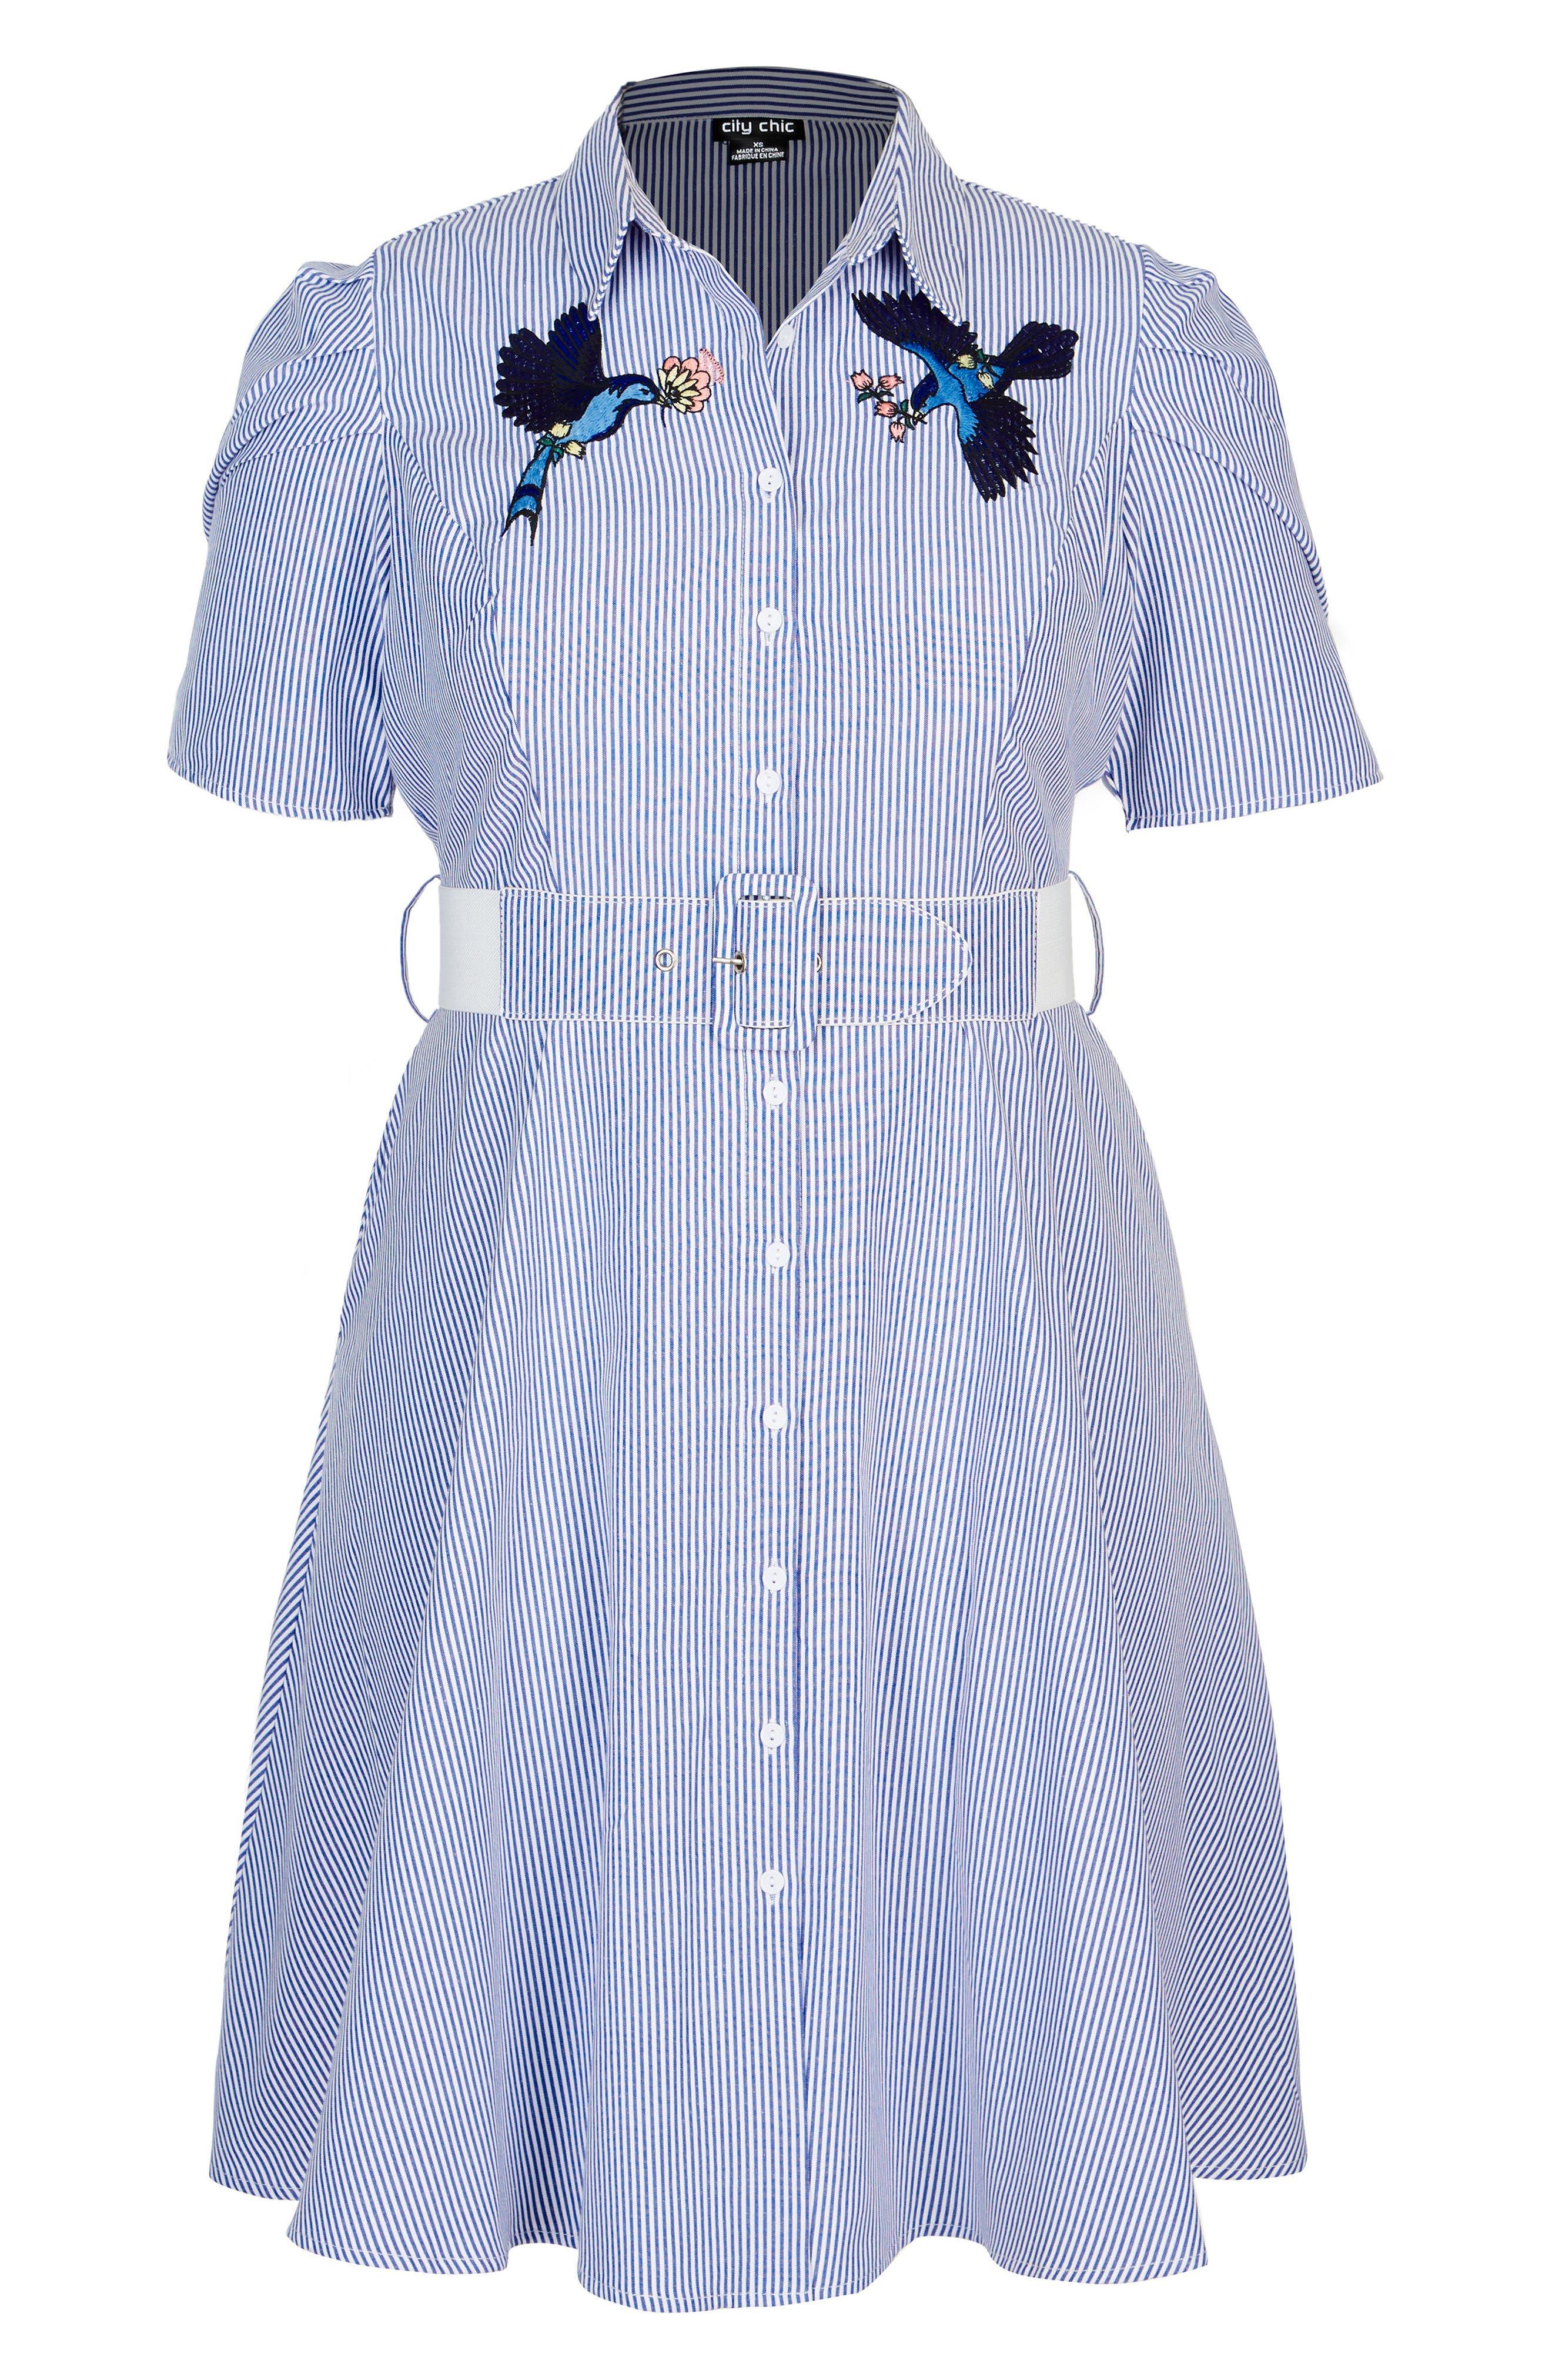 Stripe Essence Shirtdress,                             Alternate thumbnail 3, color,                             400